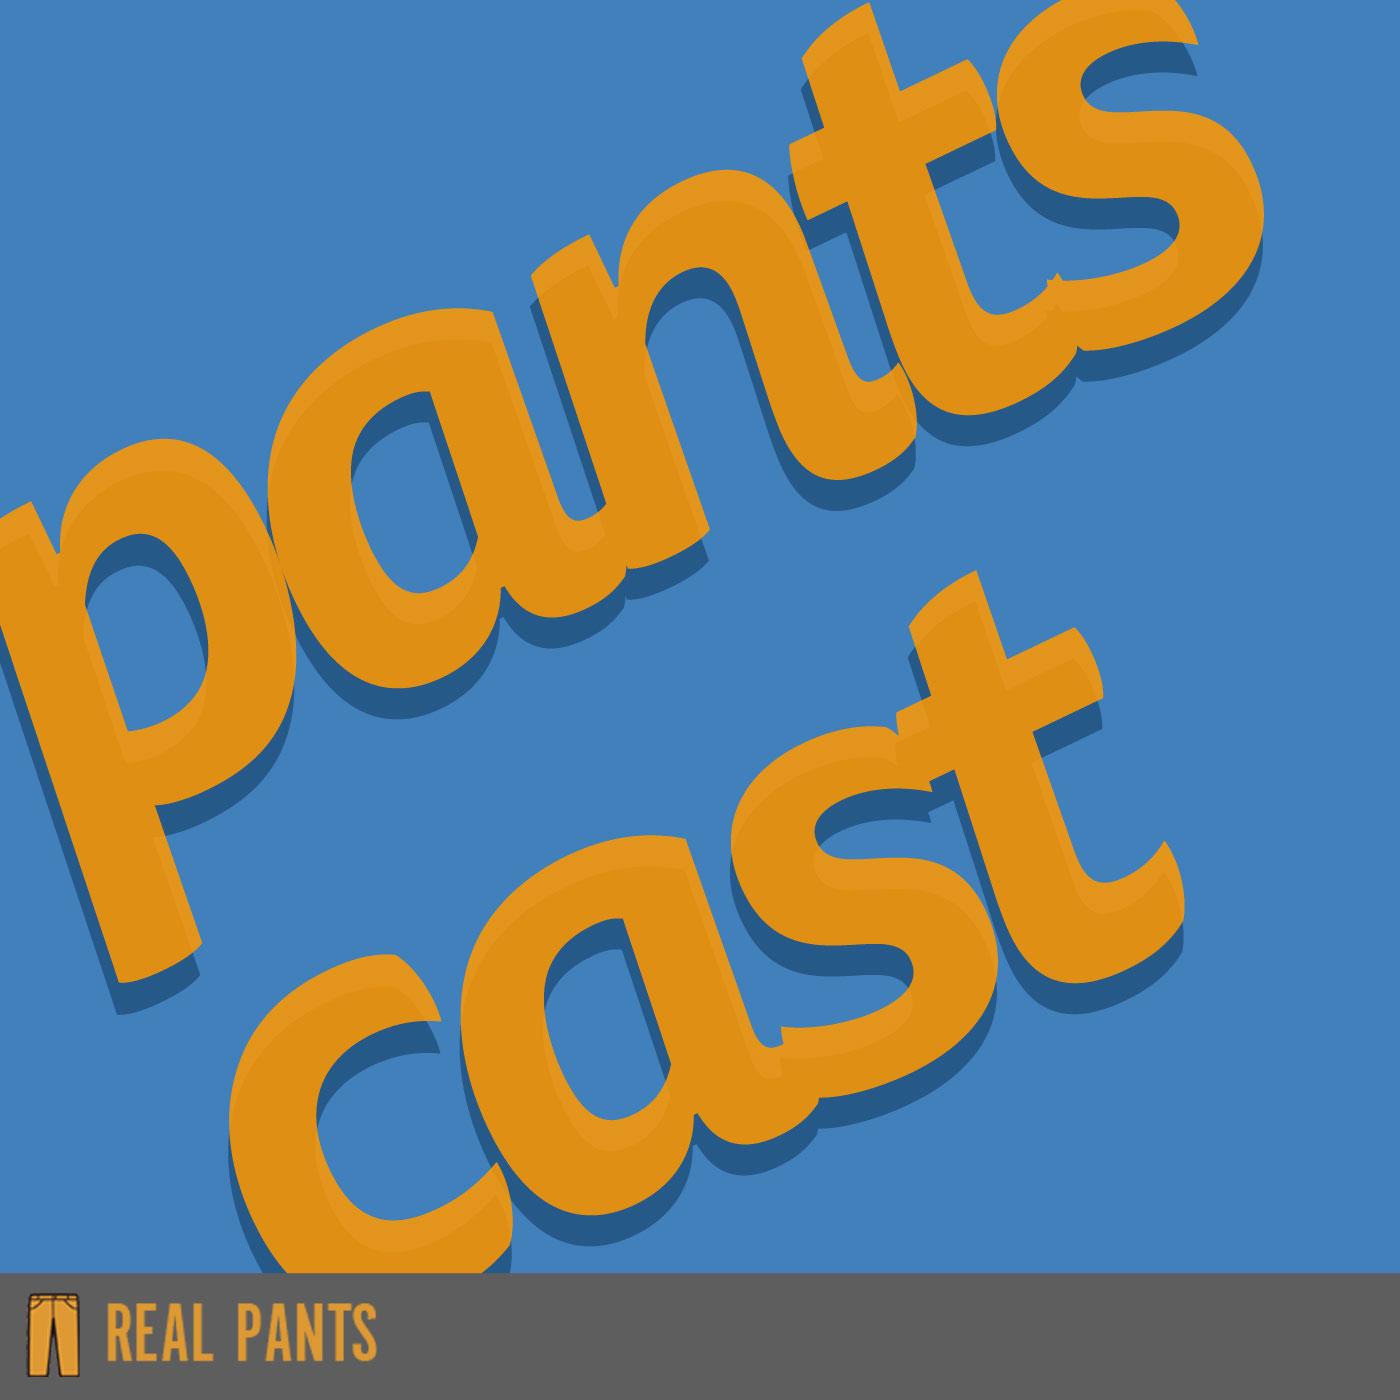 Real Pants